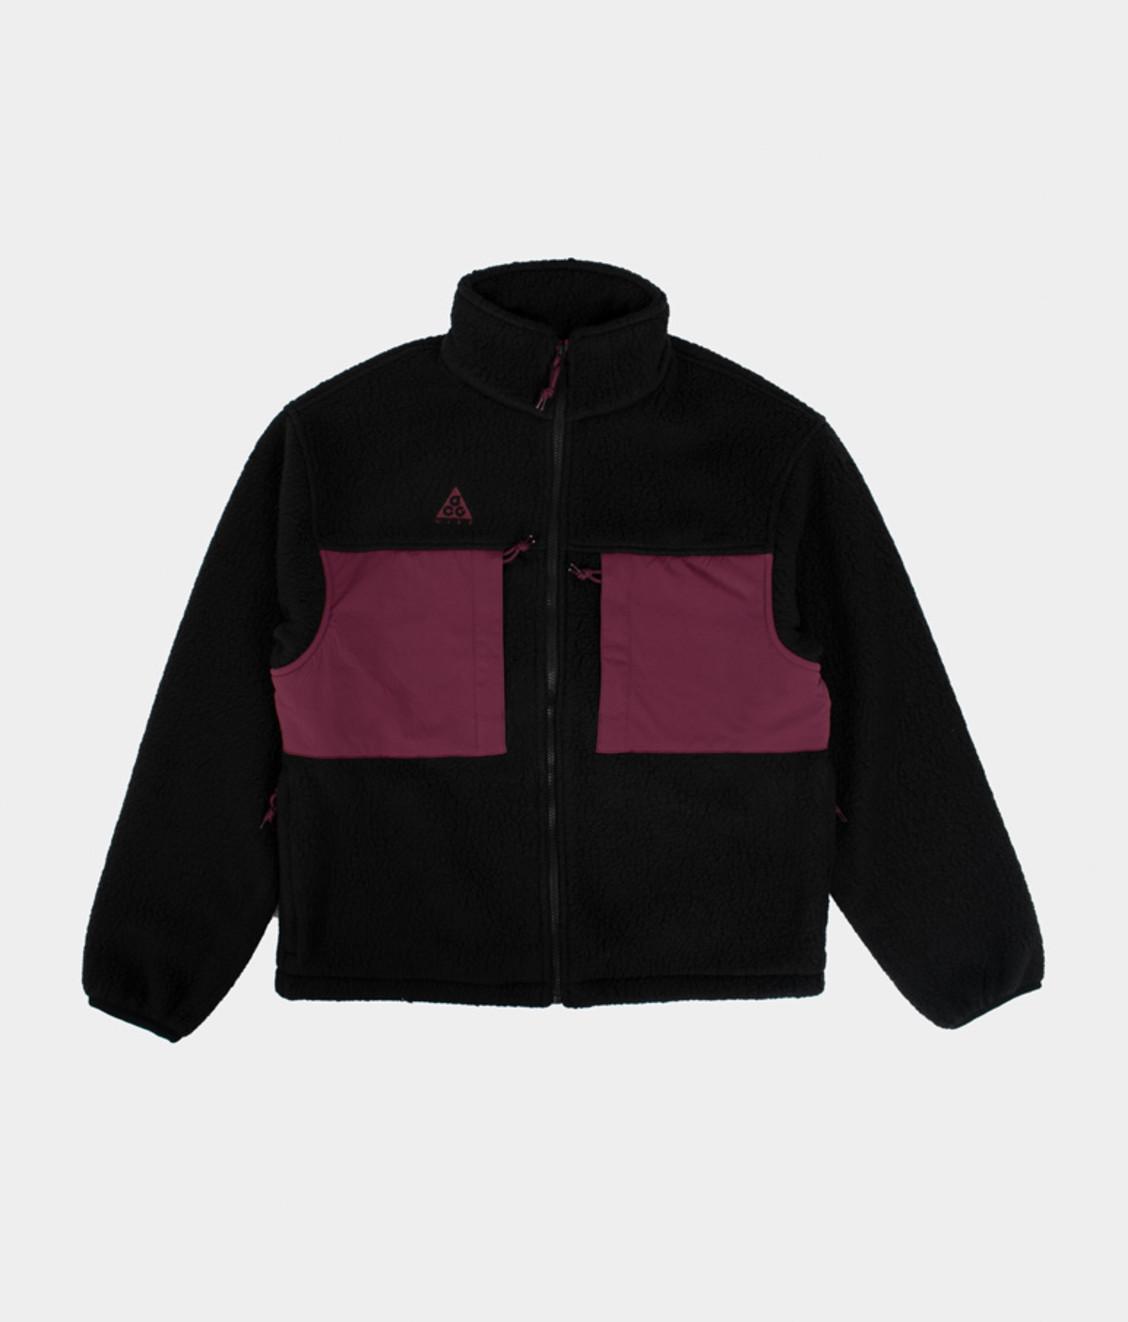 Nike Nike ACG Microfleece Jacket Black/Red